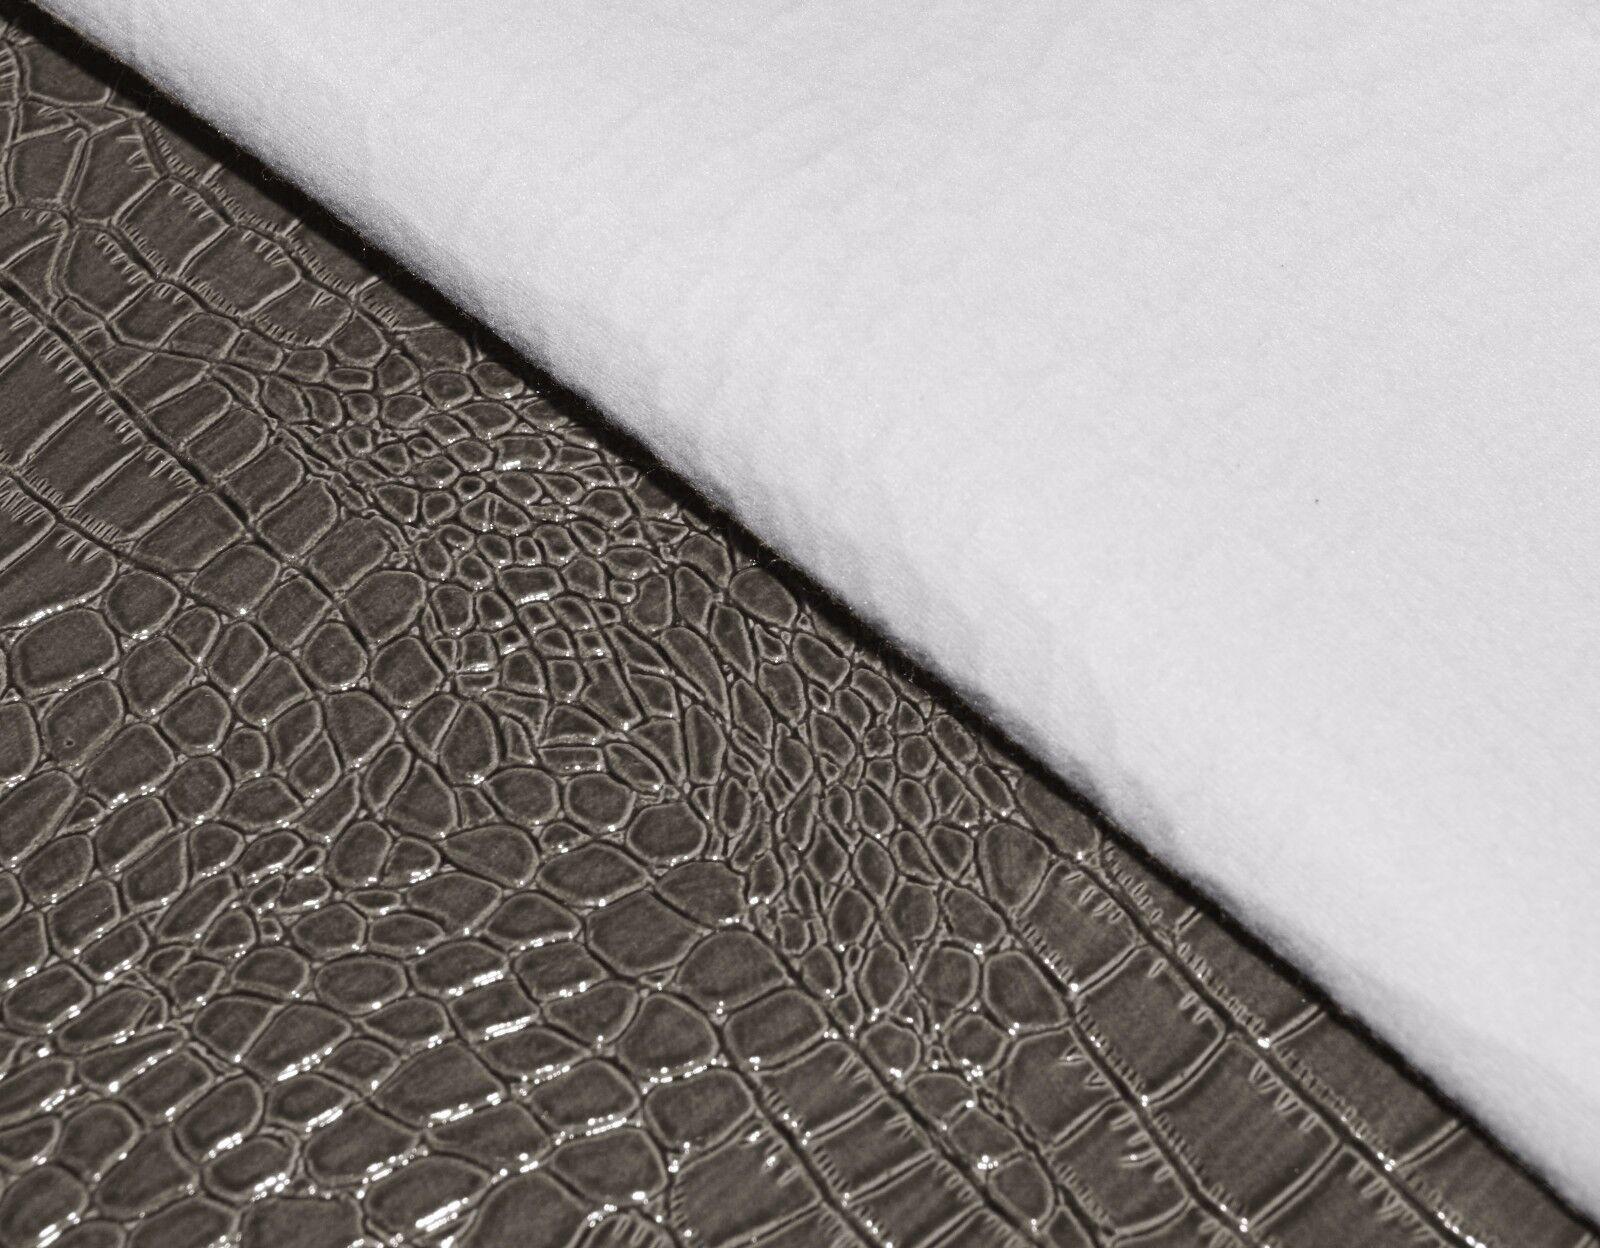 pd1021r Ash Silver Grey Round Faux Crocodile Glossy Leather Cushion Cover Custom